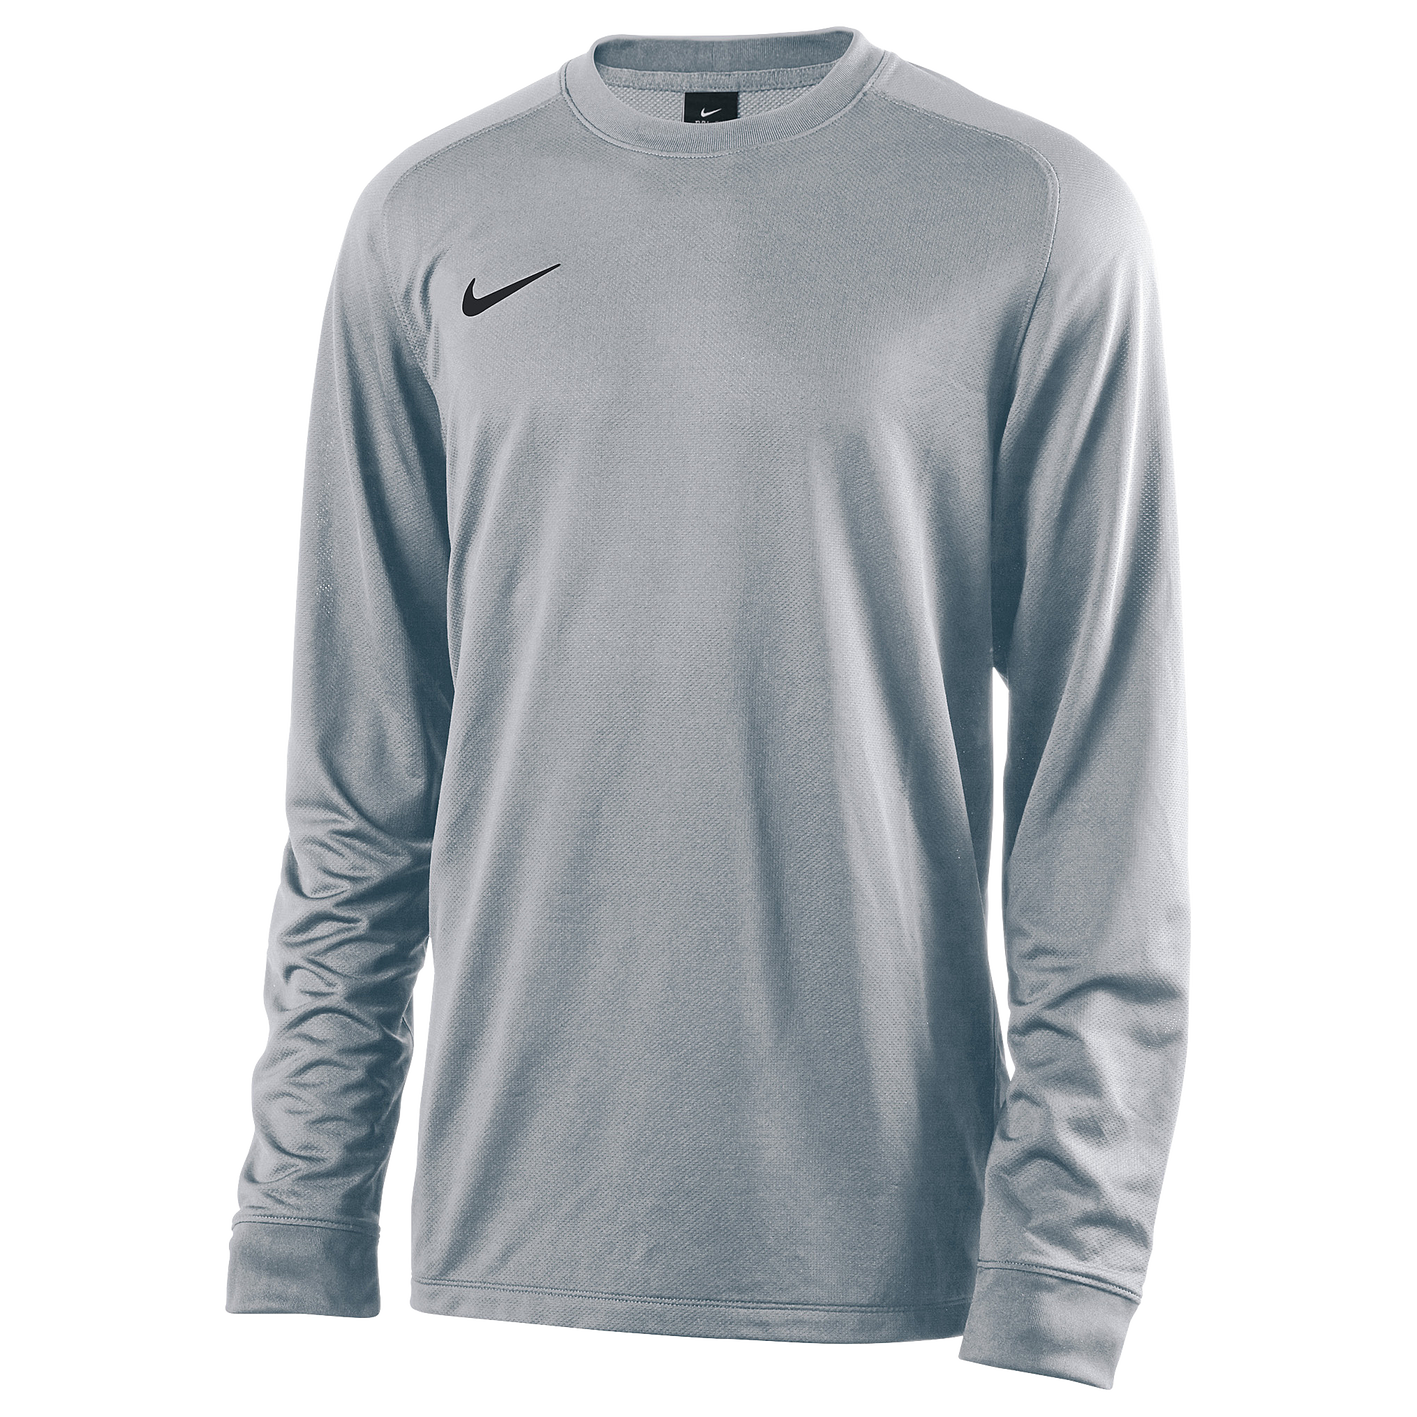 948d7b33c Nike Team Park II L S Goalie Jersey - Boys  Grade School - Soccer ...